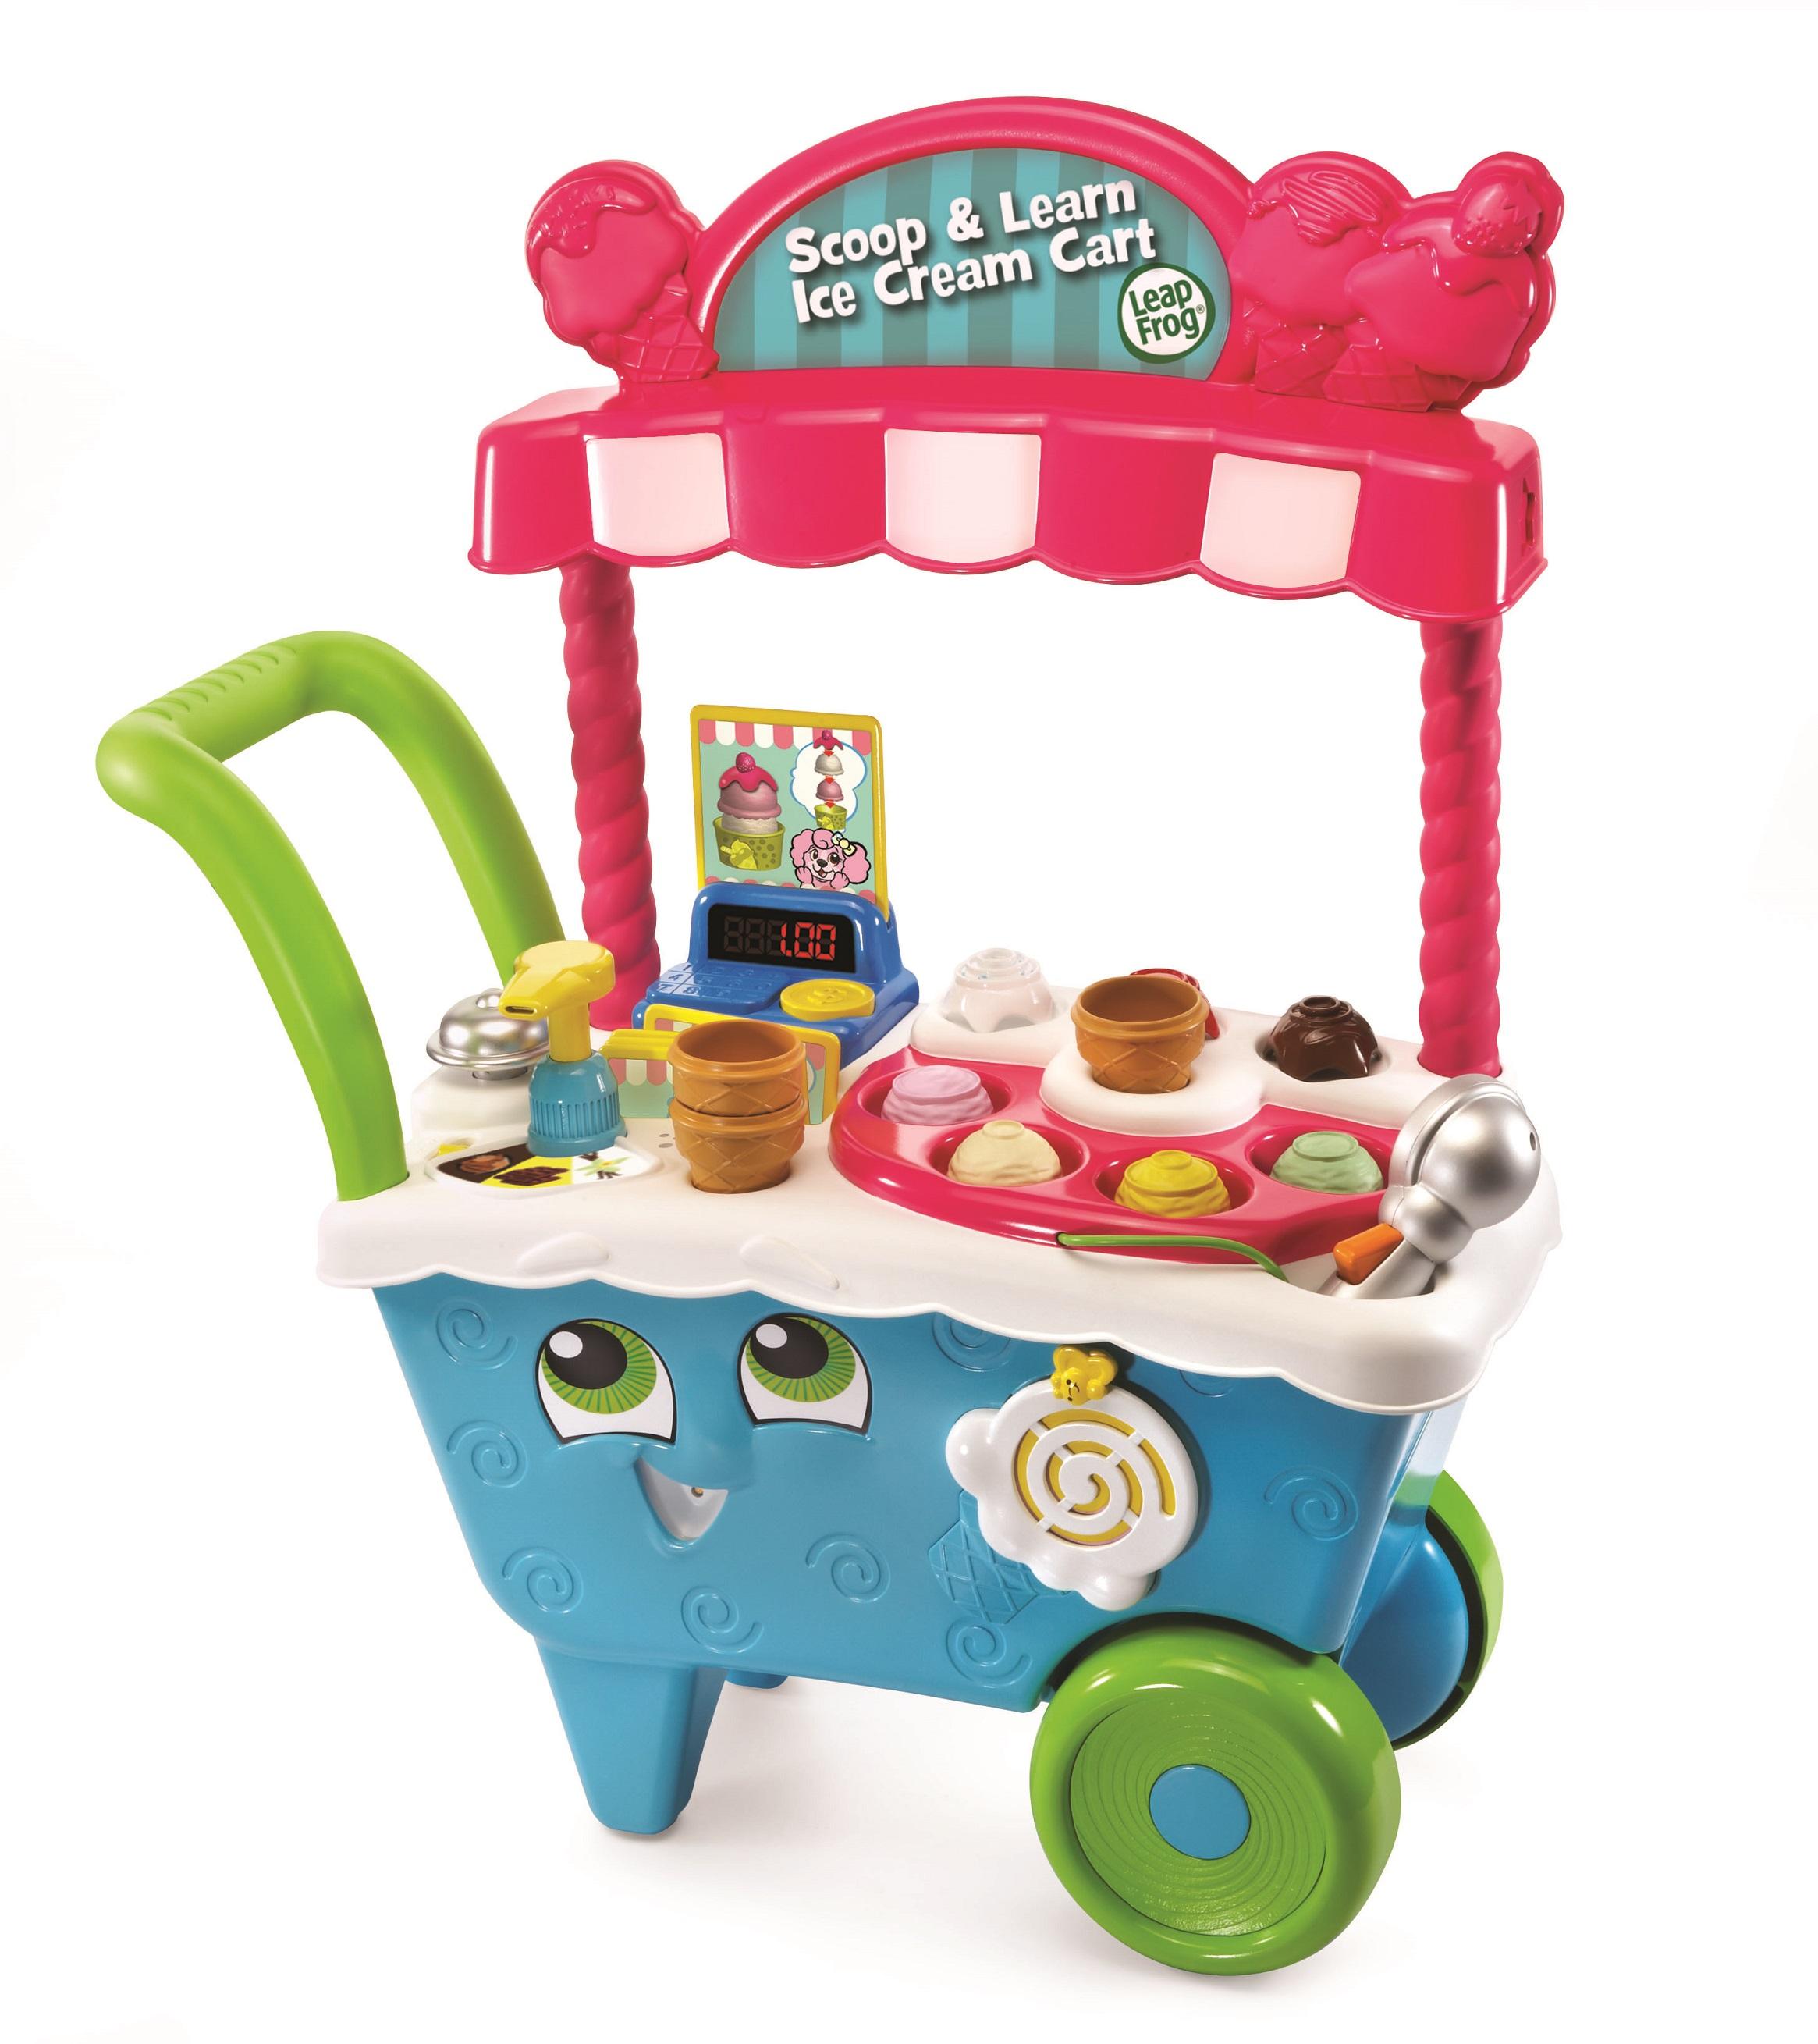 LeapFrog Scoop & Learn Ice Cream Cart_original